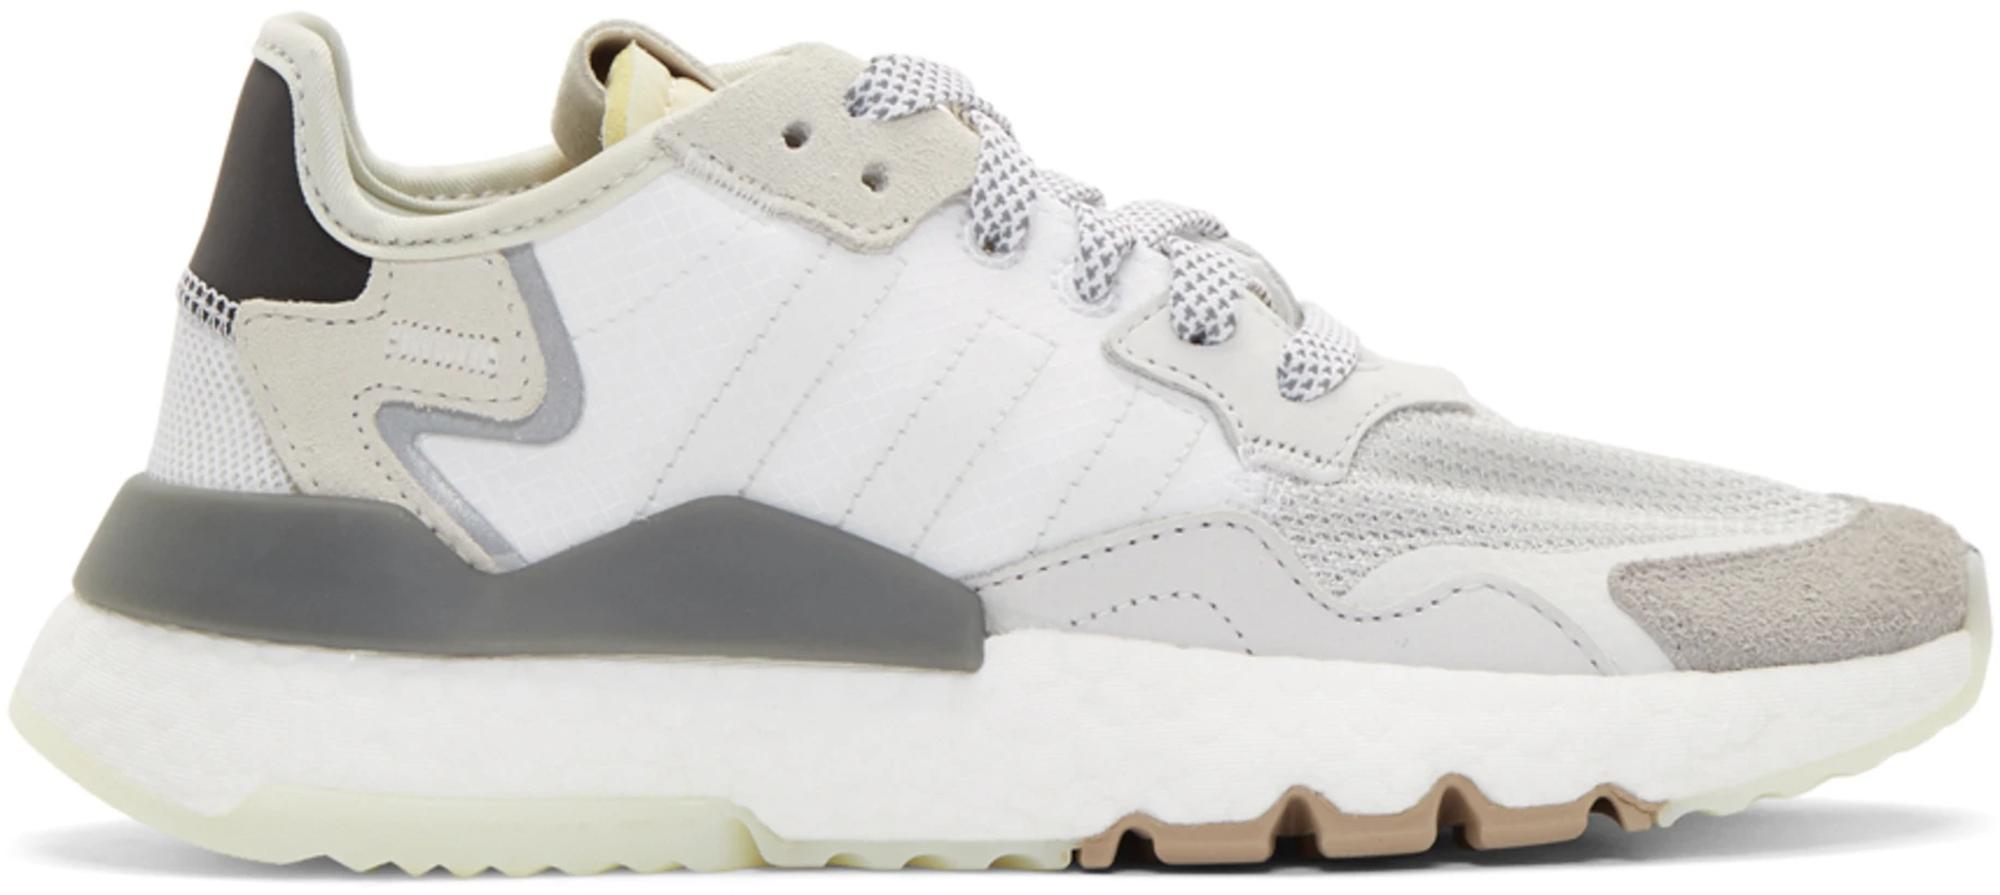 adidas Nite Jogger White Grey